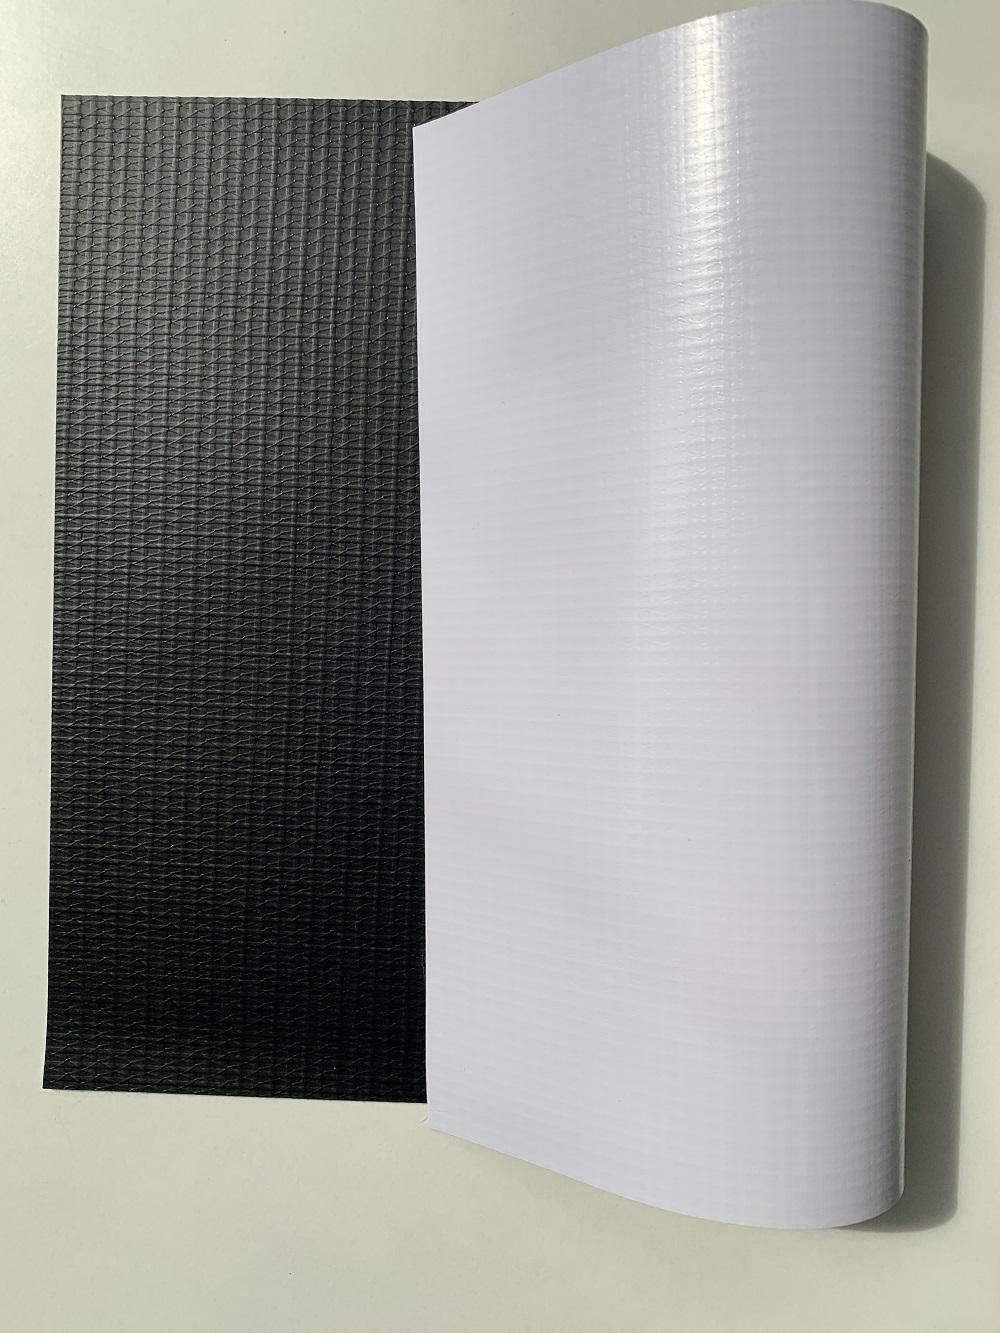 Lona Impressão Digital 260G Brilho F. Preto 200x300 2,50x50m